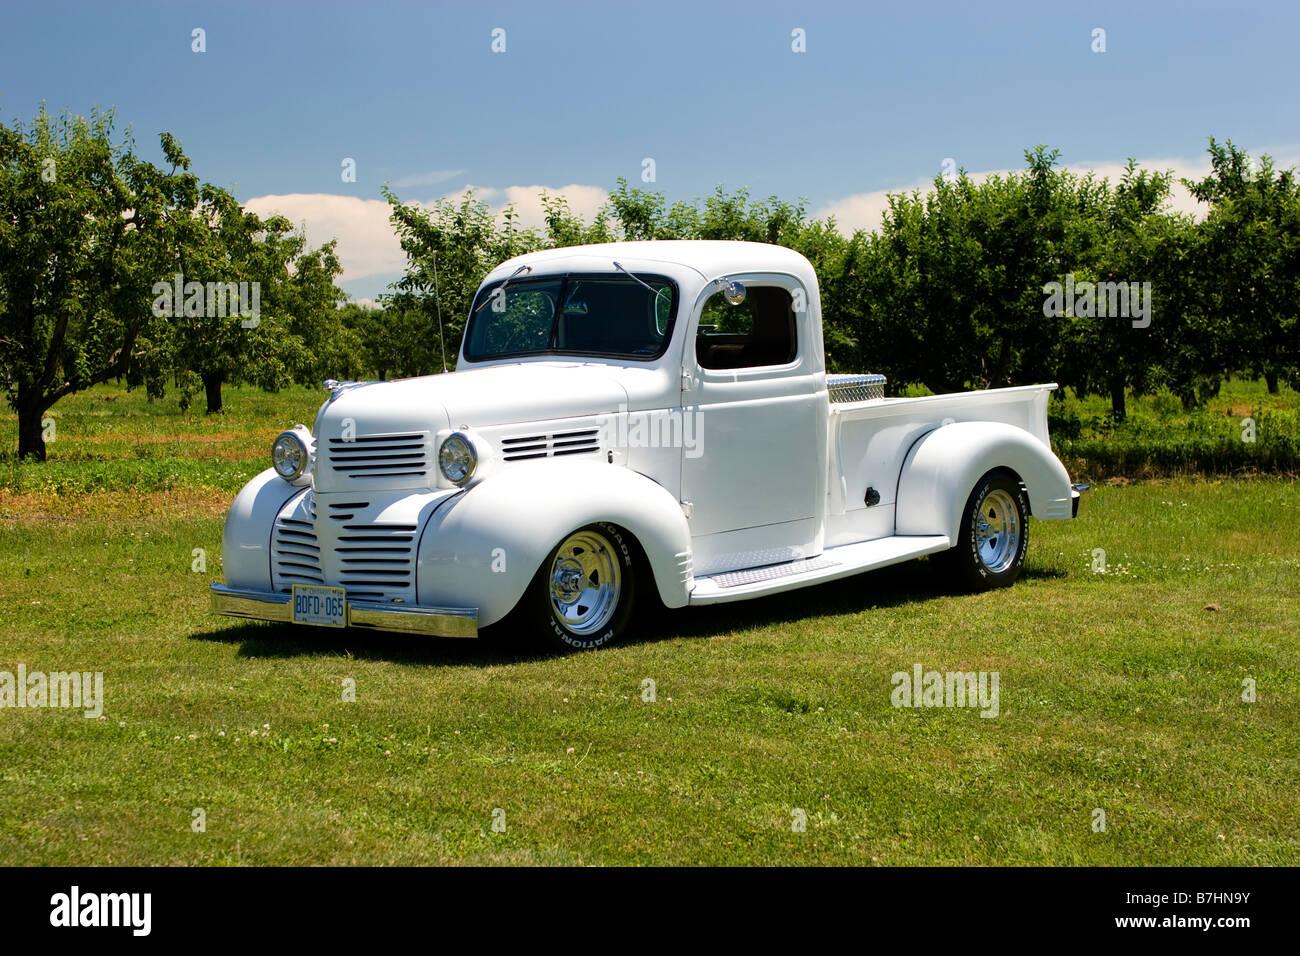 1940 Custom Dodge Pickup Truck Stock Photo Alamy